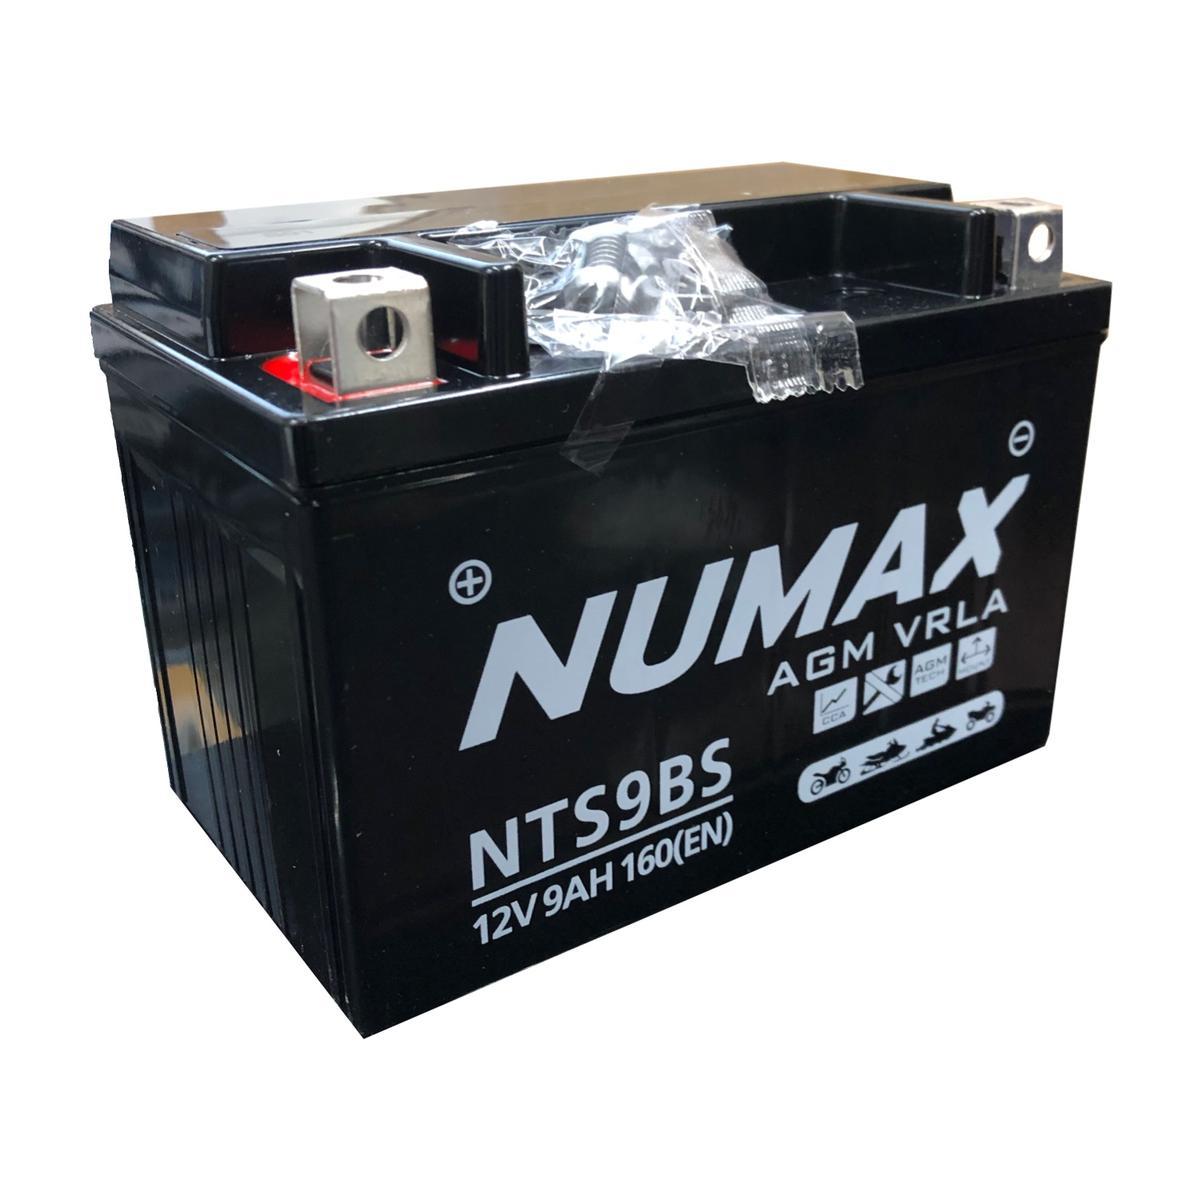 Numax NTS9BS 12v Motorbike Bike Battery KYMCO 125cc B&W YXT9-4